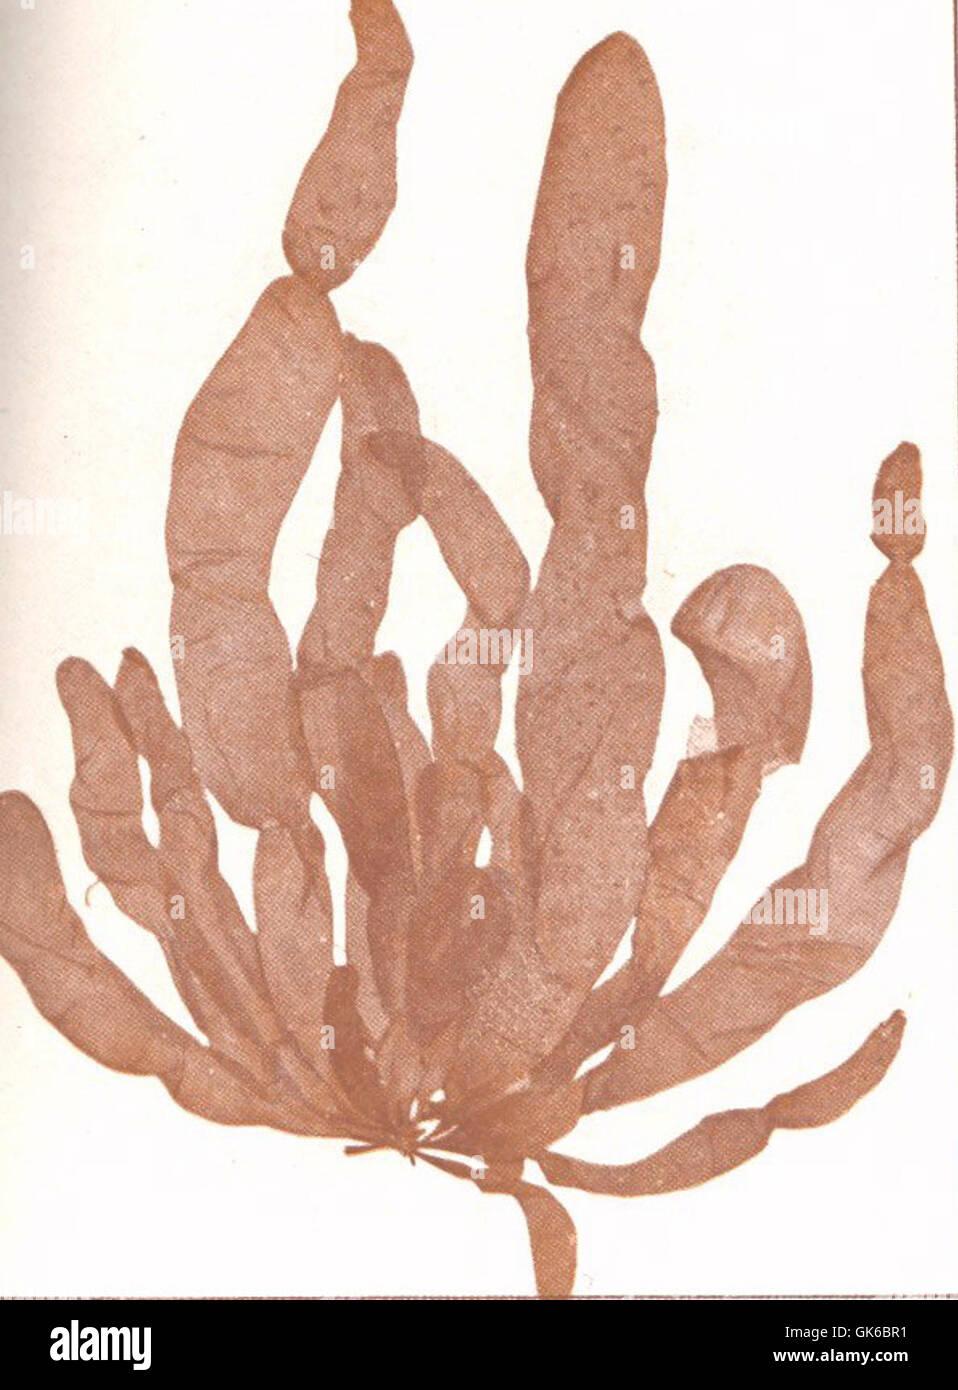 Asperococcus Stock Photos & Asperococcus Stock Images - Alamy